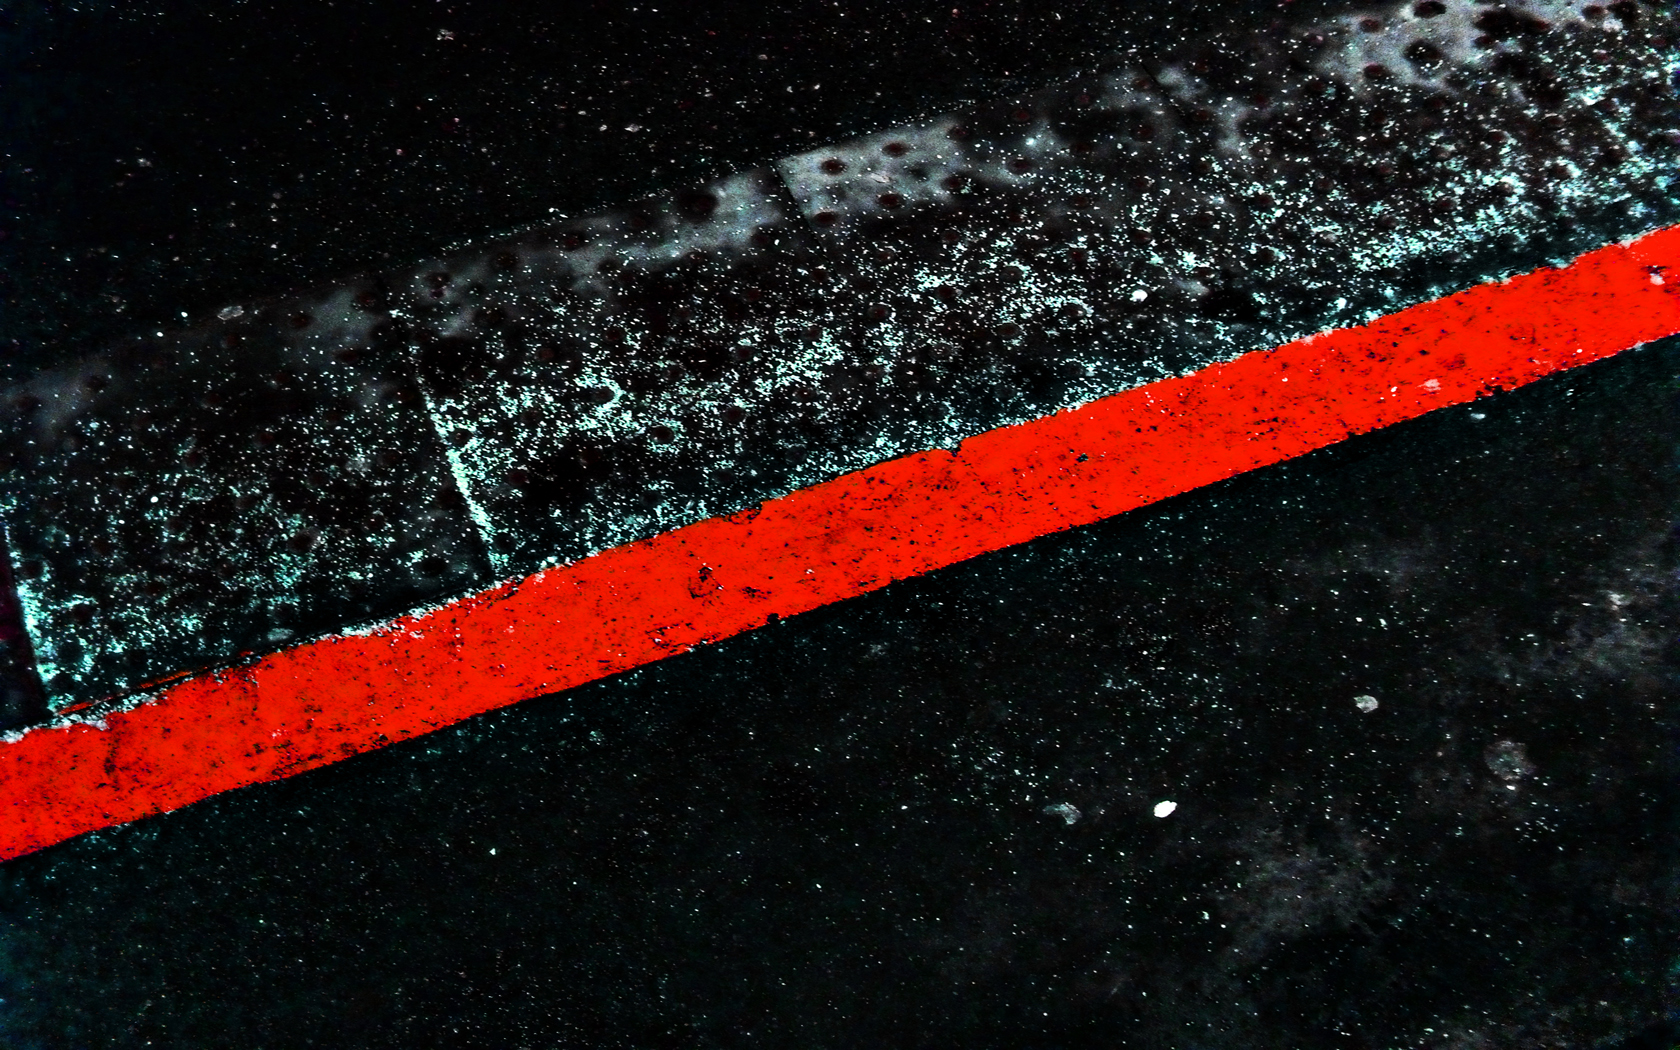 The Line Wallpaper Set - Red by shaggysivirus on DeviantArt